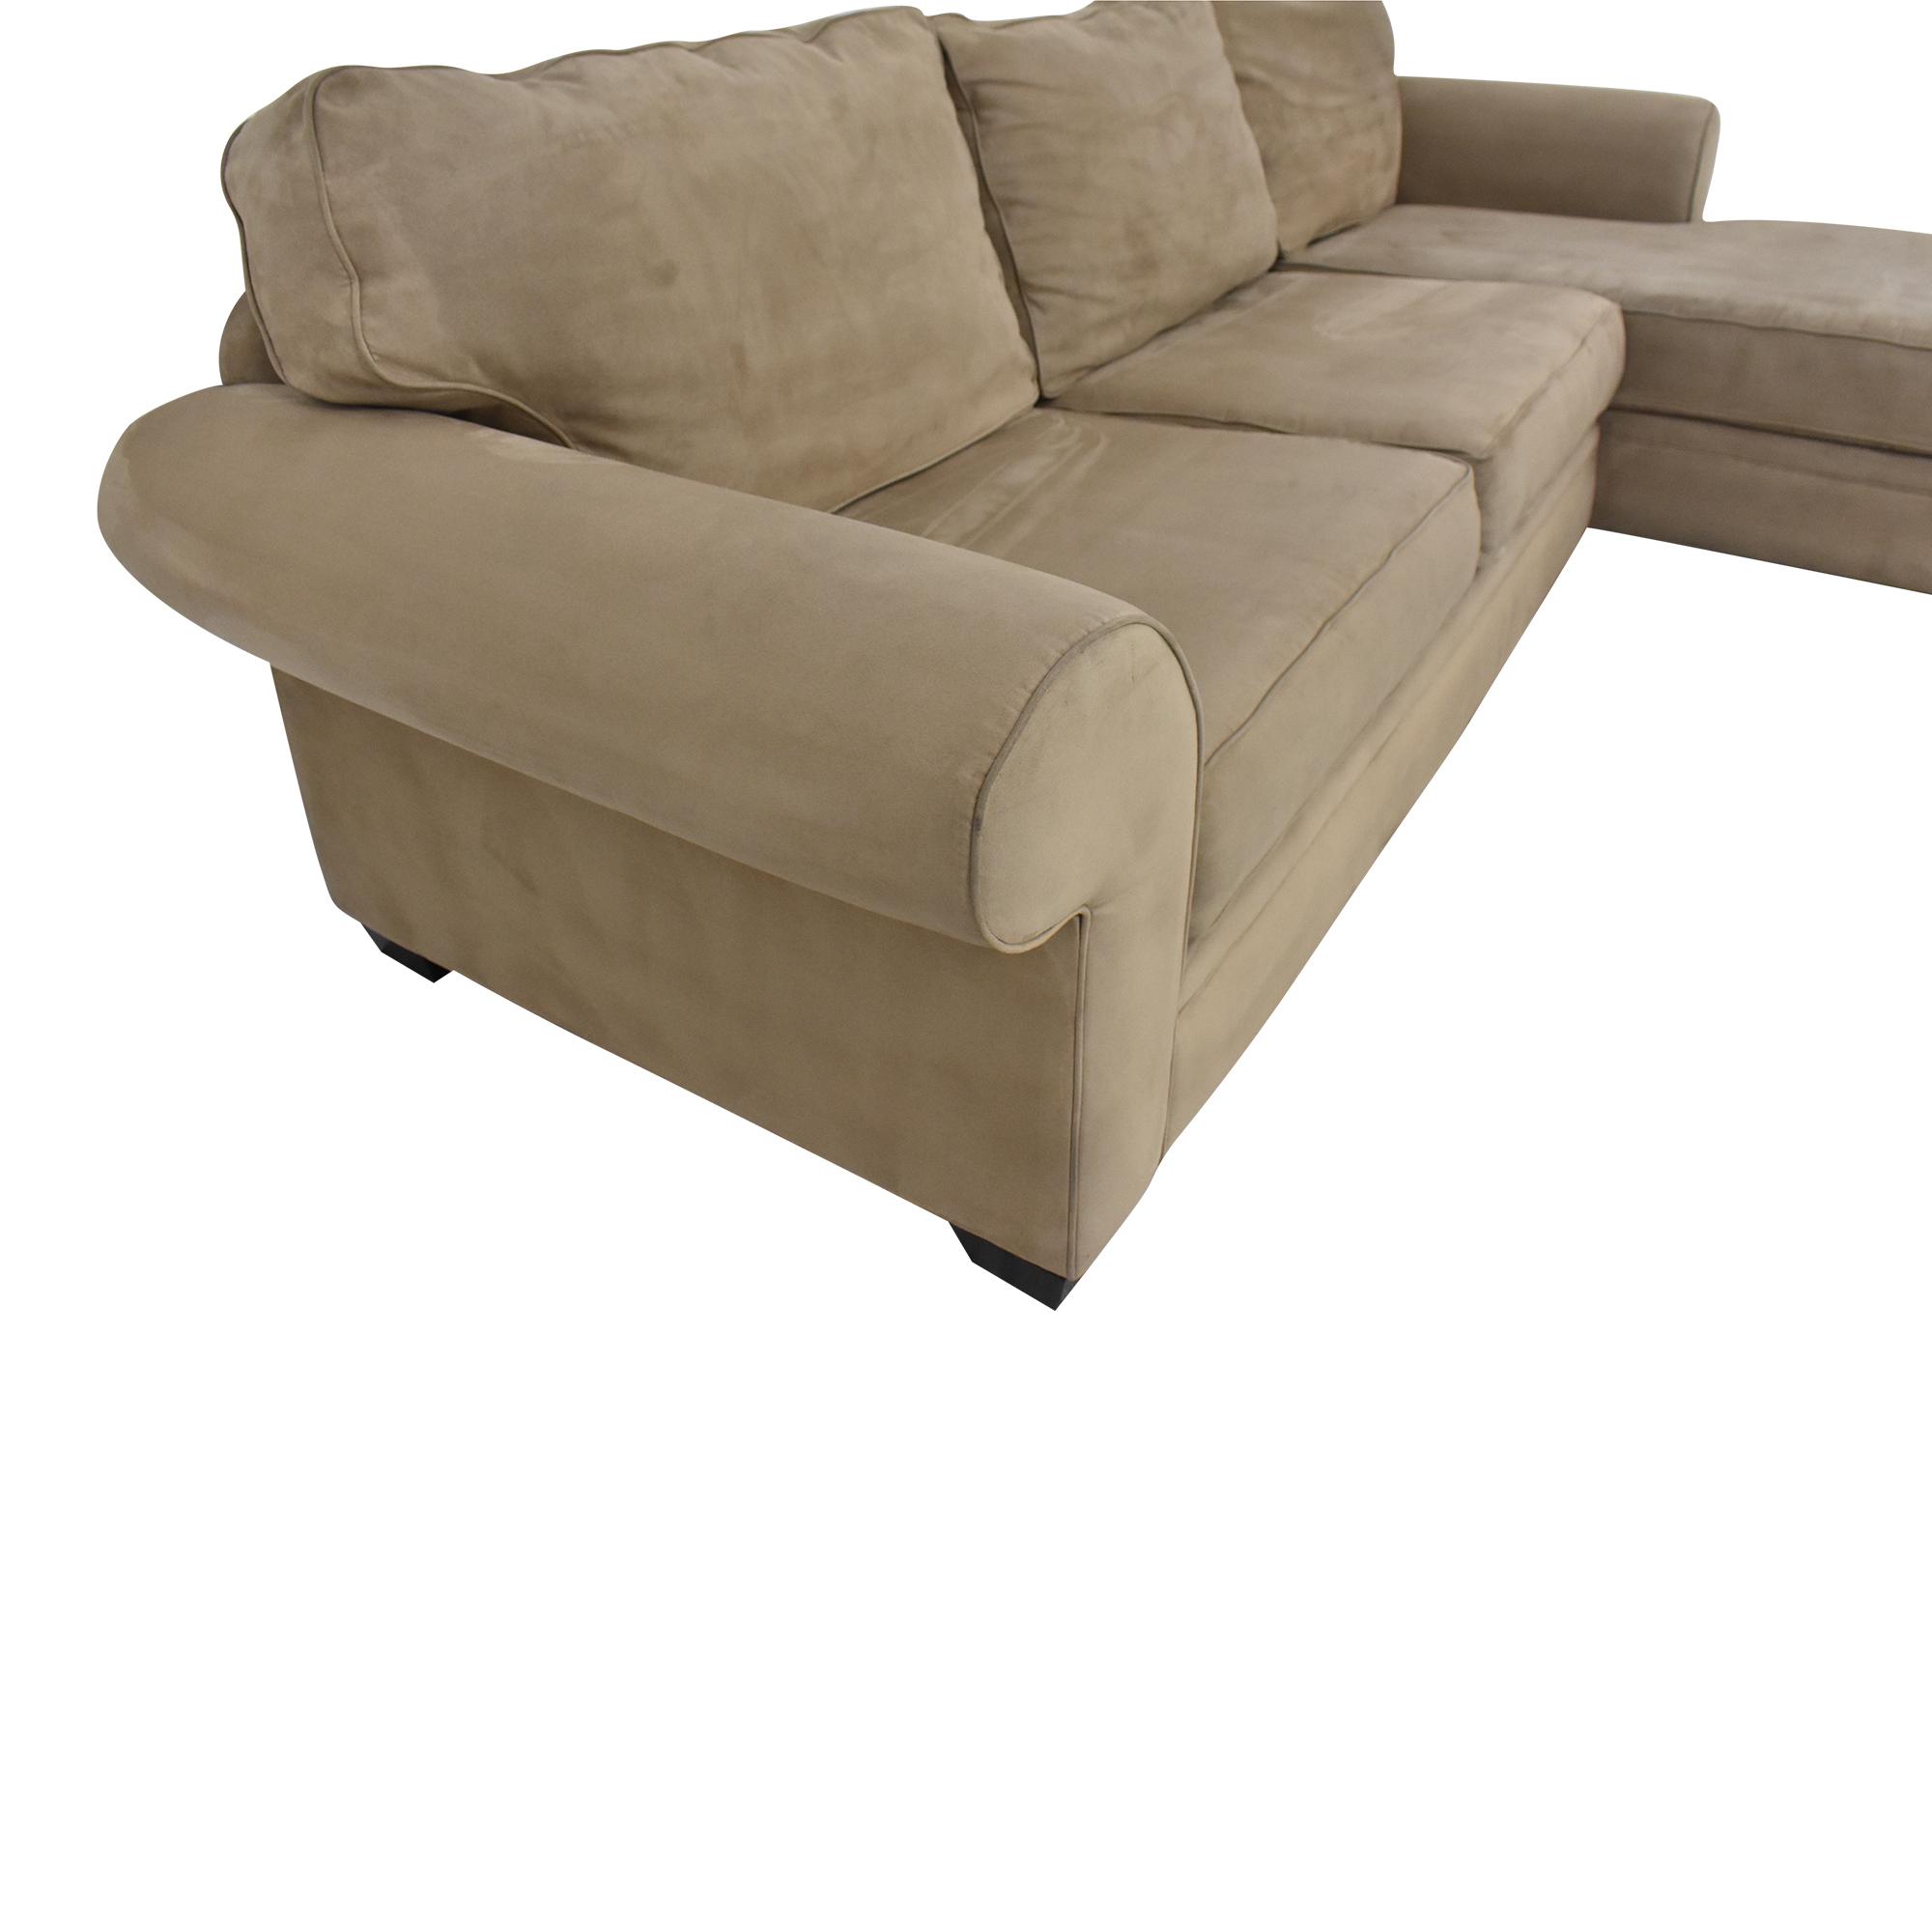 Macy's Jonathan Louis Chaise Sectional Sofa pa